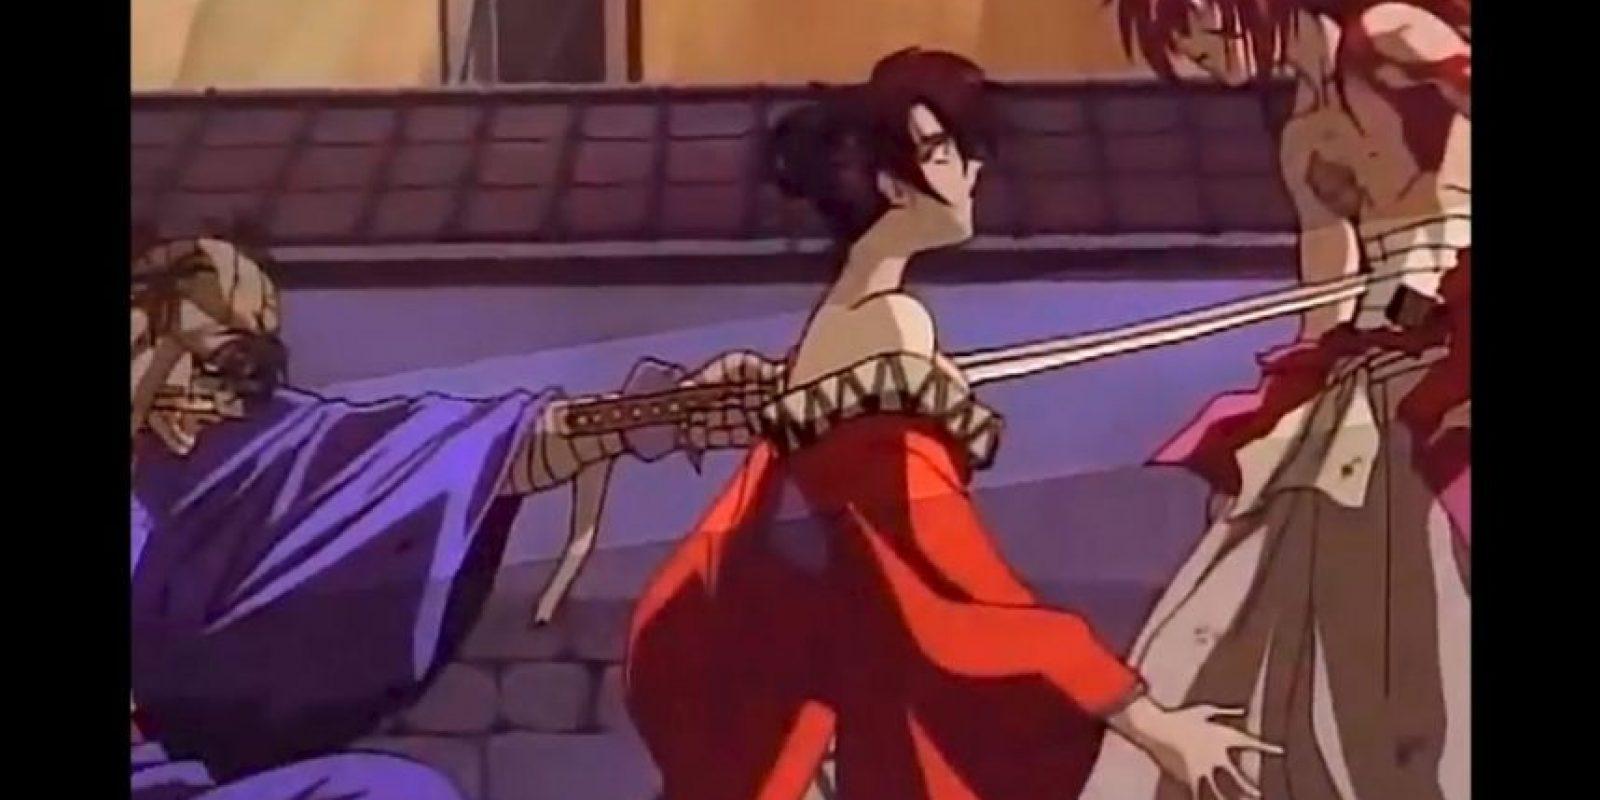 Así enfrentó a Kenshin, a costa de su amante. Foto:Studio DEEN